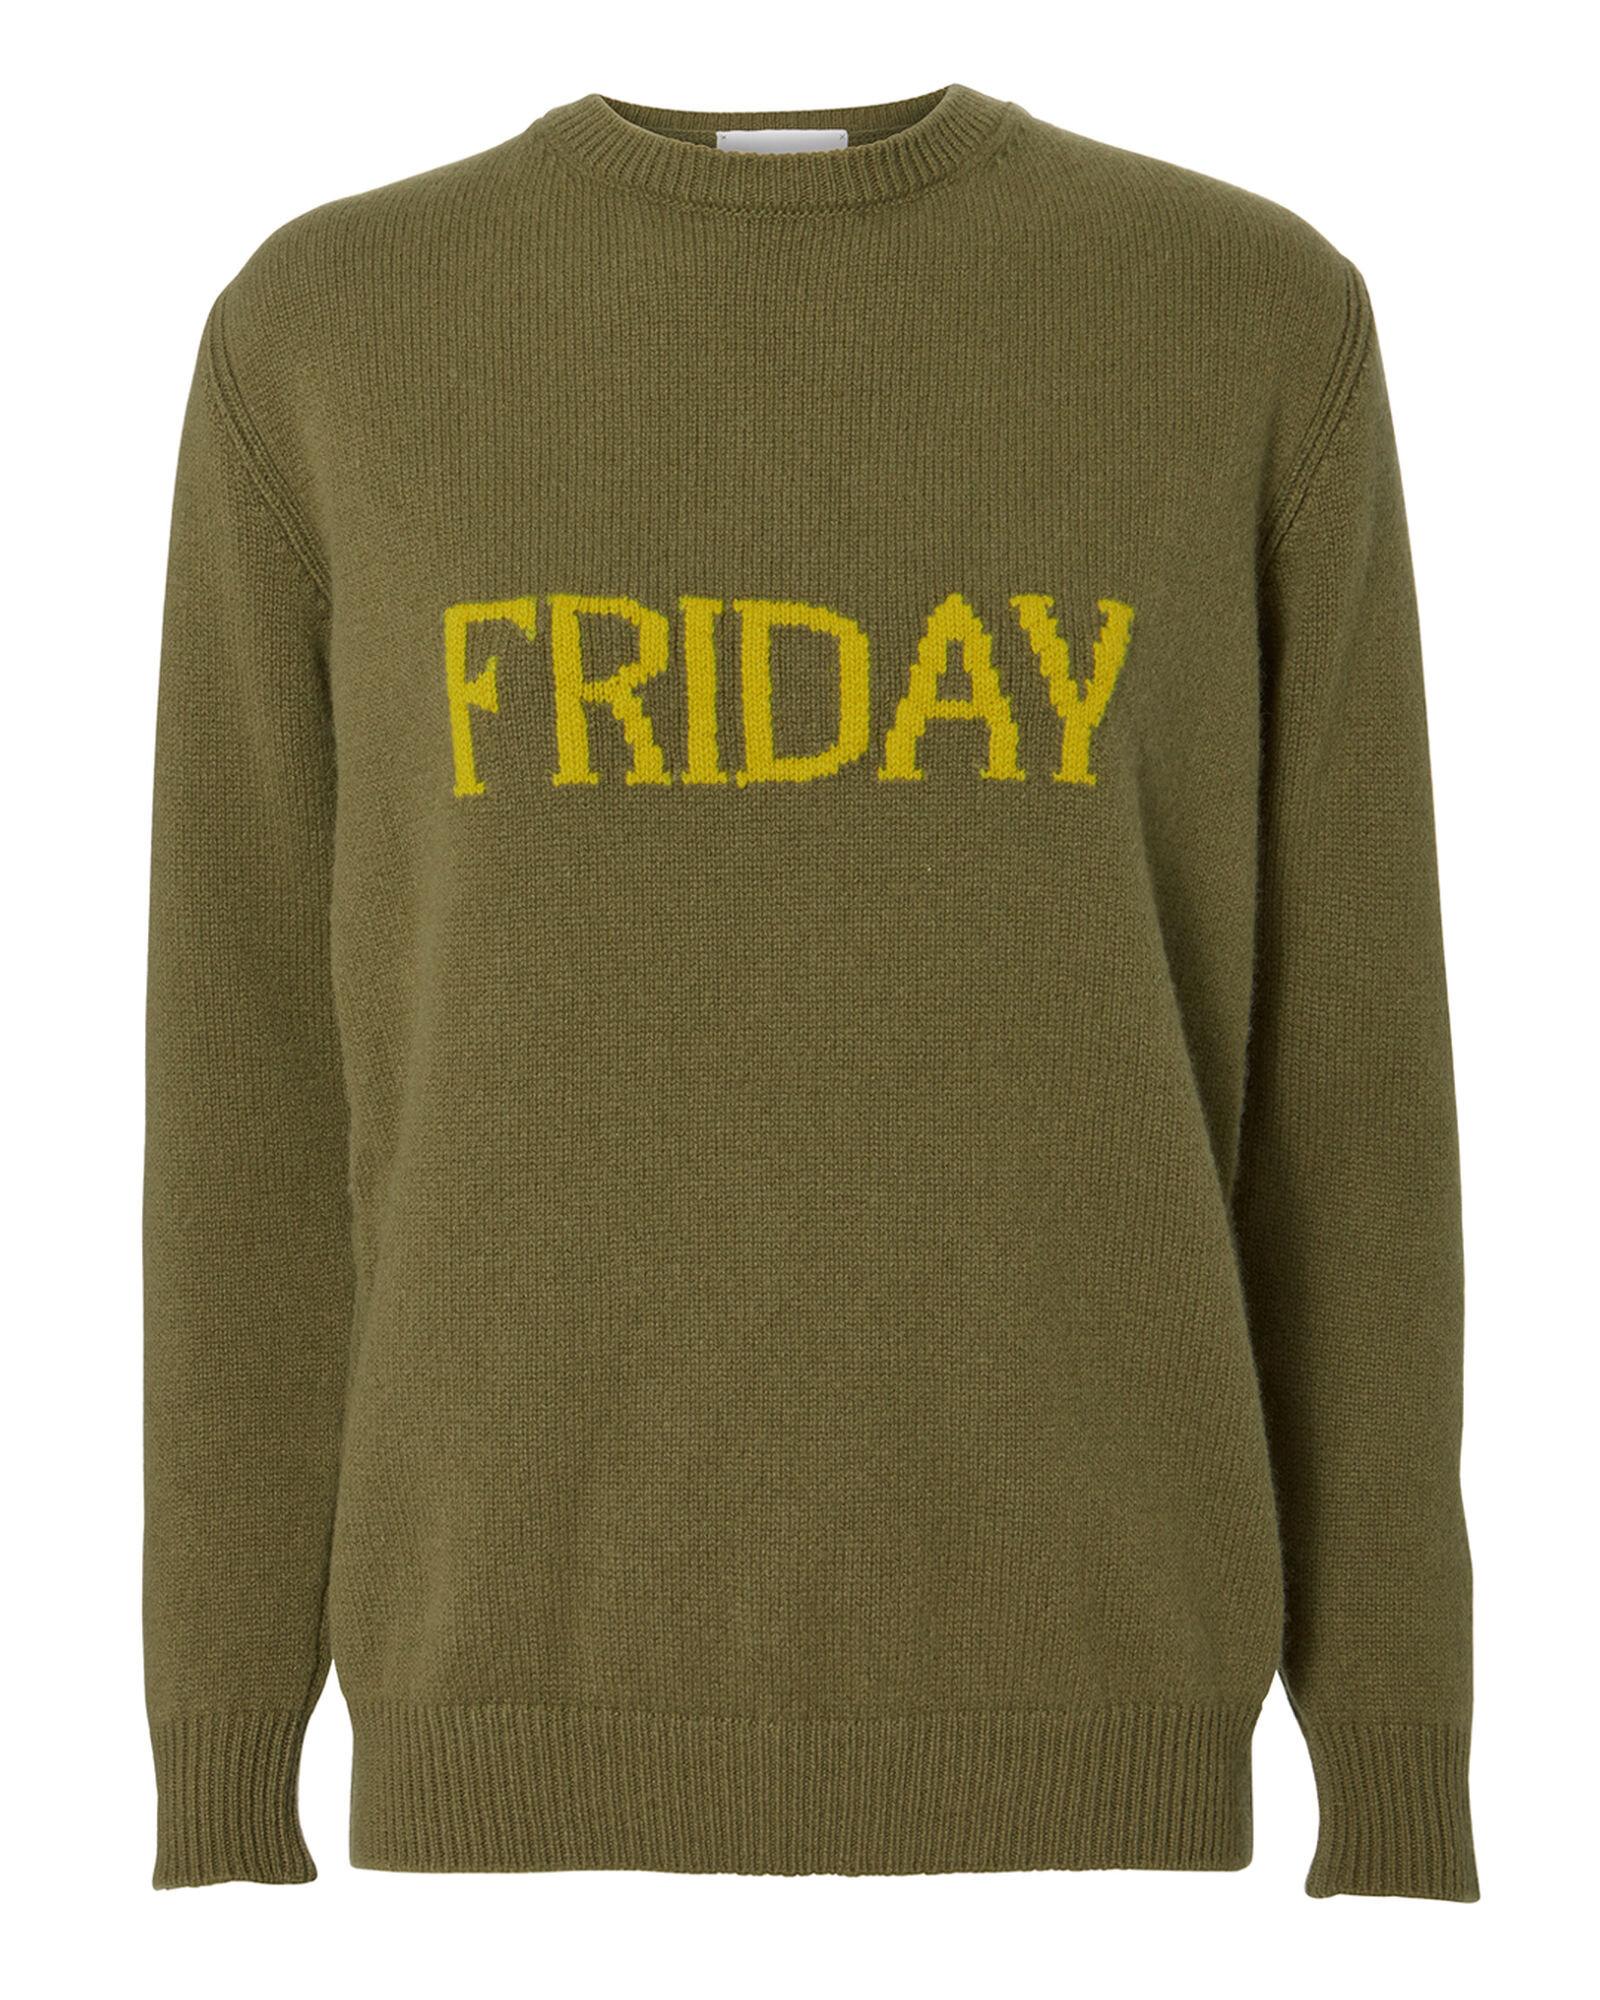 Alberta ferretti sweater -